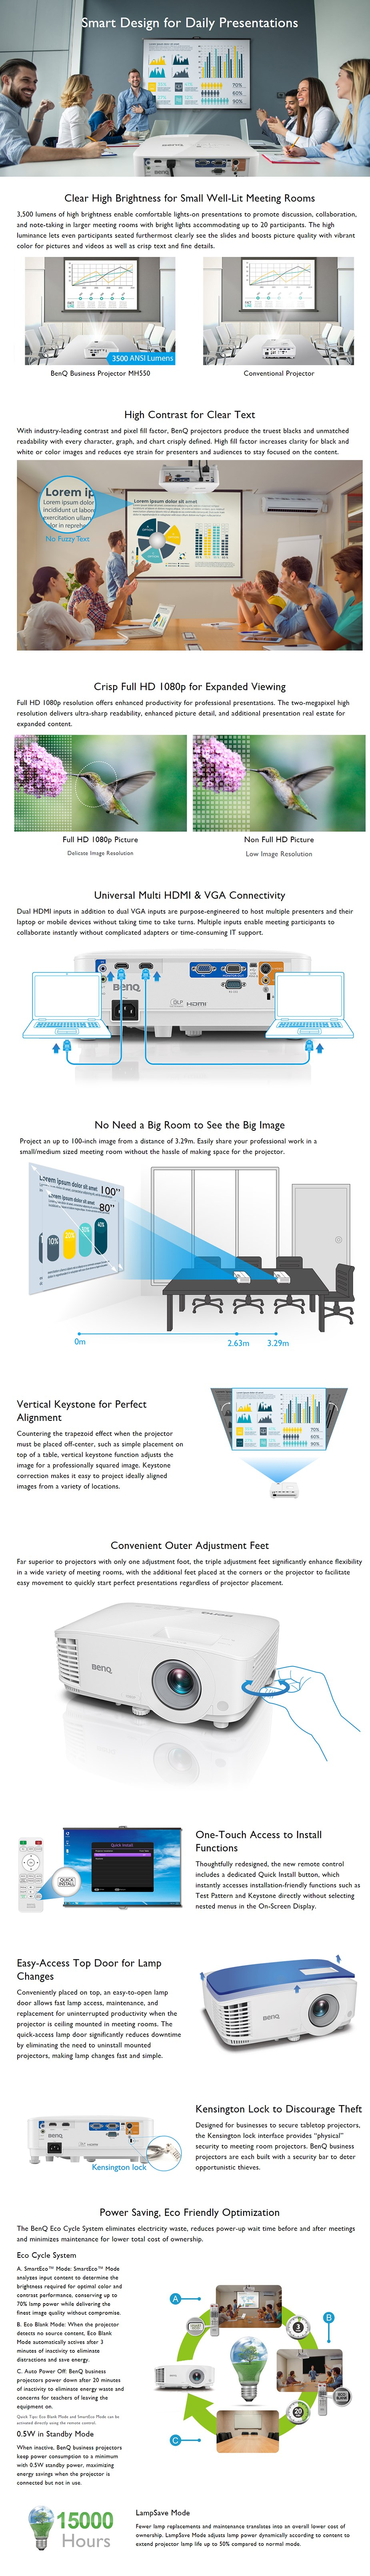 BenQ MH550 Eco-Friendly FHD 1080p Business DLP Projector - Desktop Overview 1